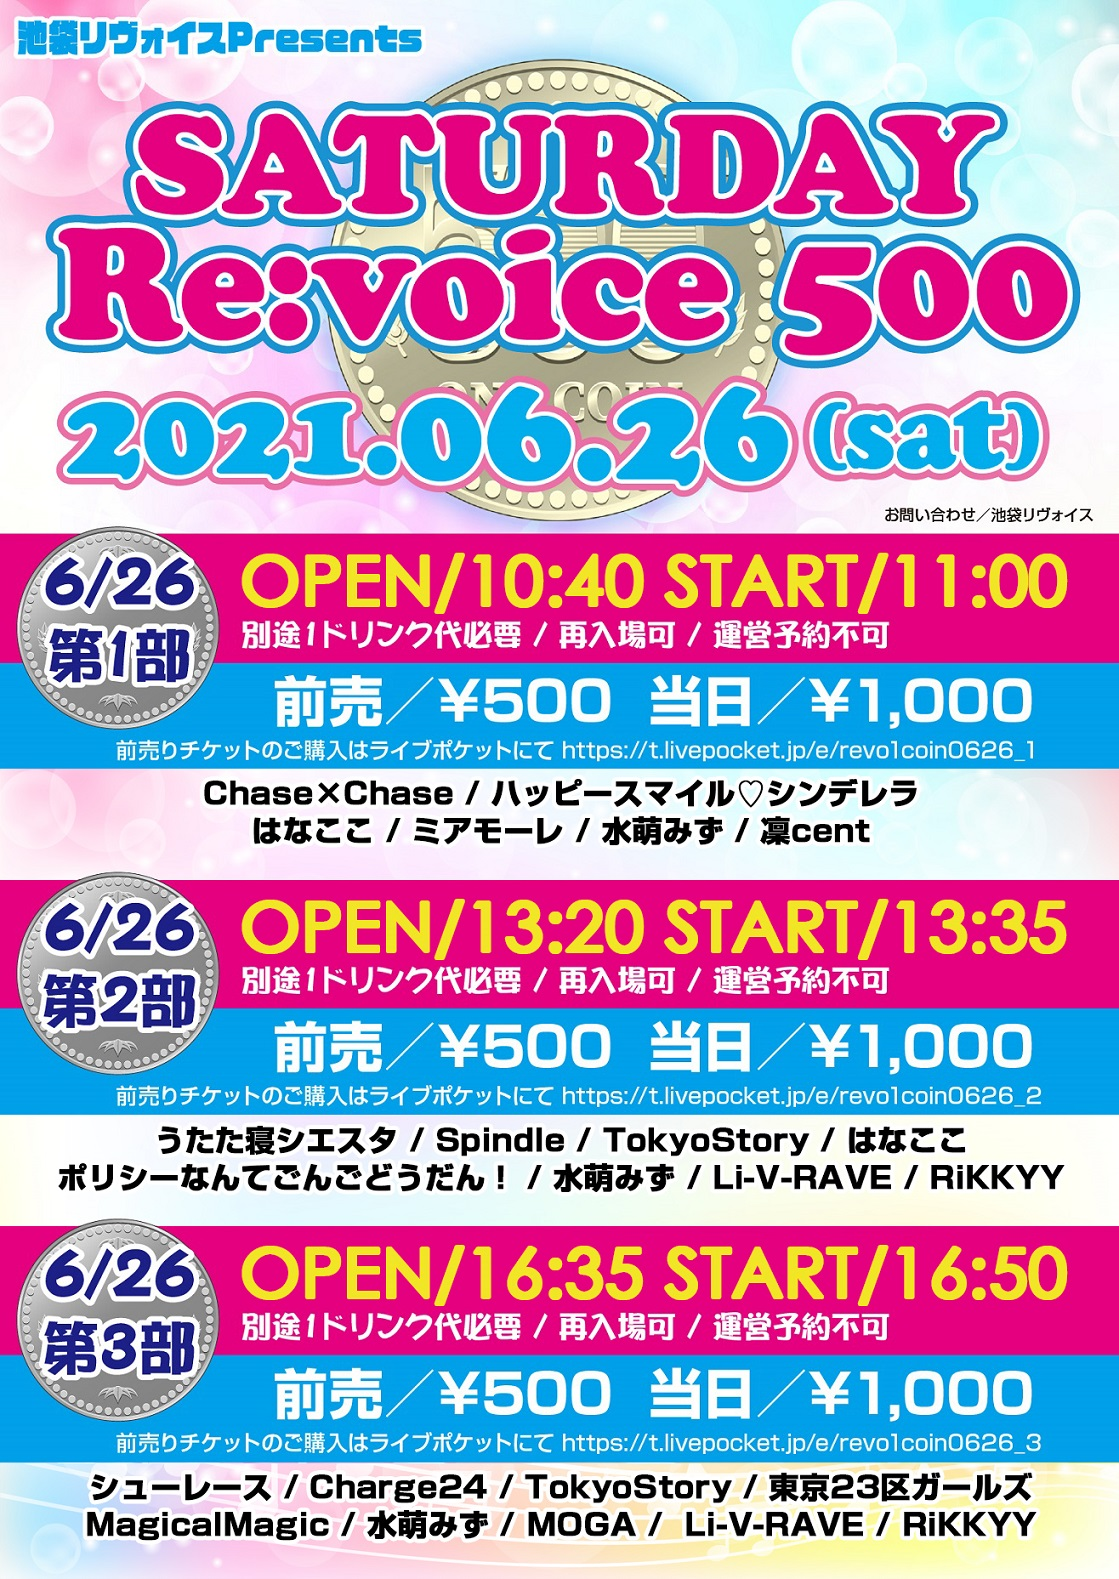 【第三部】SATURDAY Re:voice 500